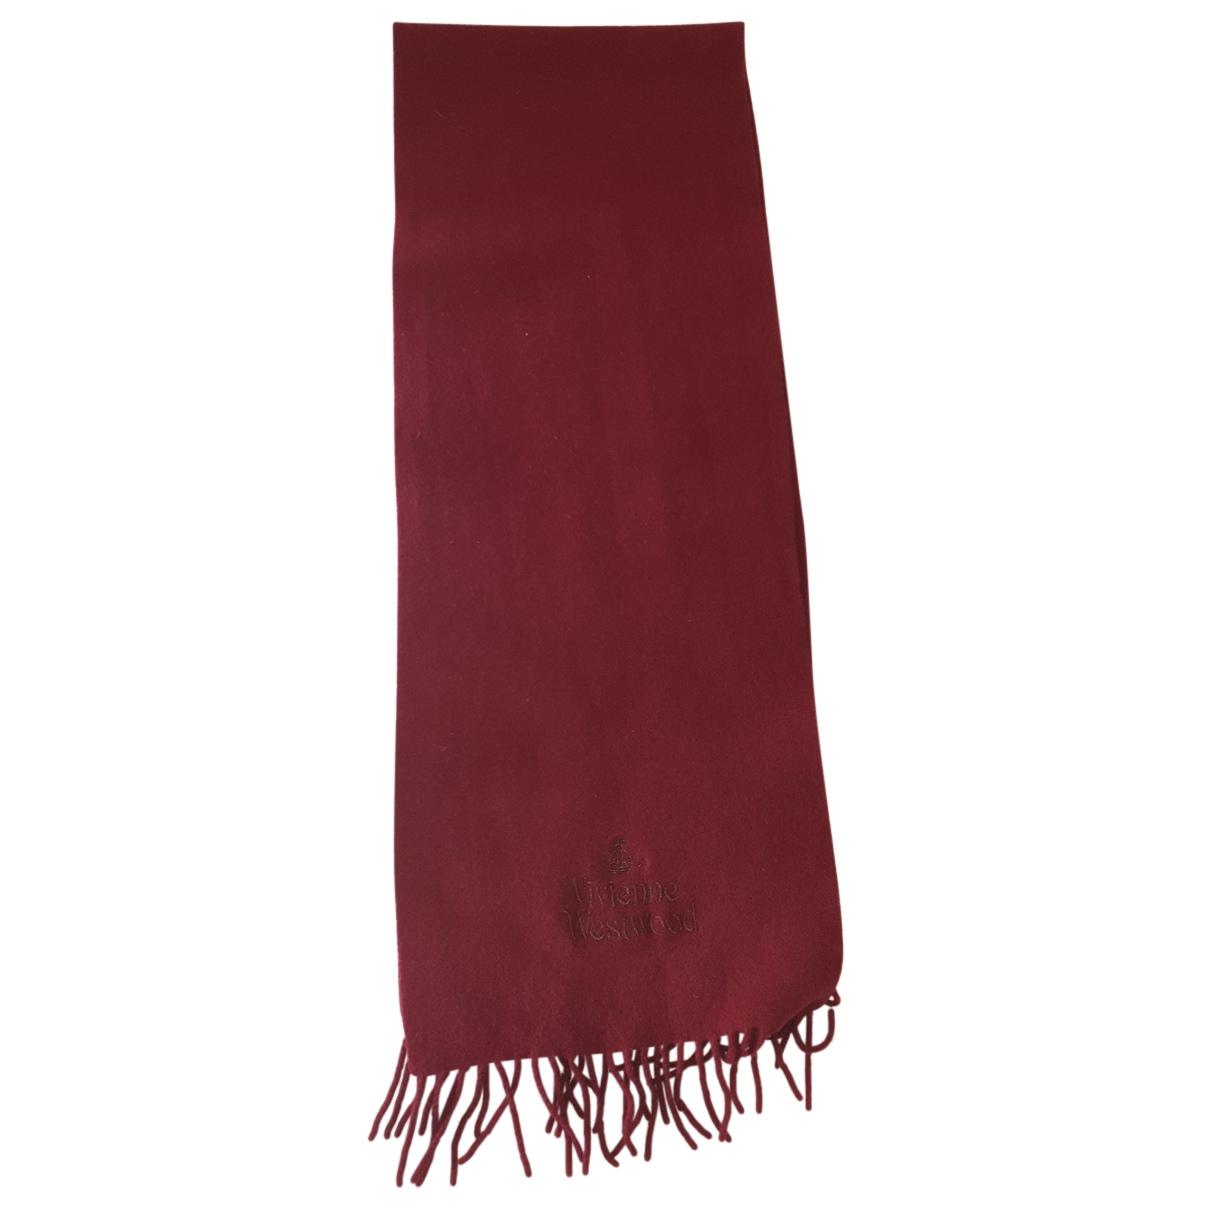 Vivienne Westwood \N Schal in  Bordeauxrot Wolle